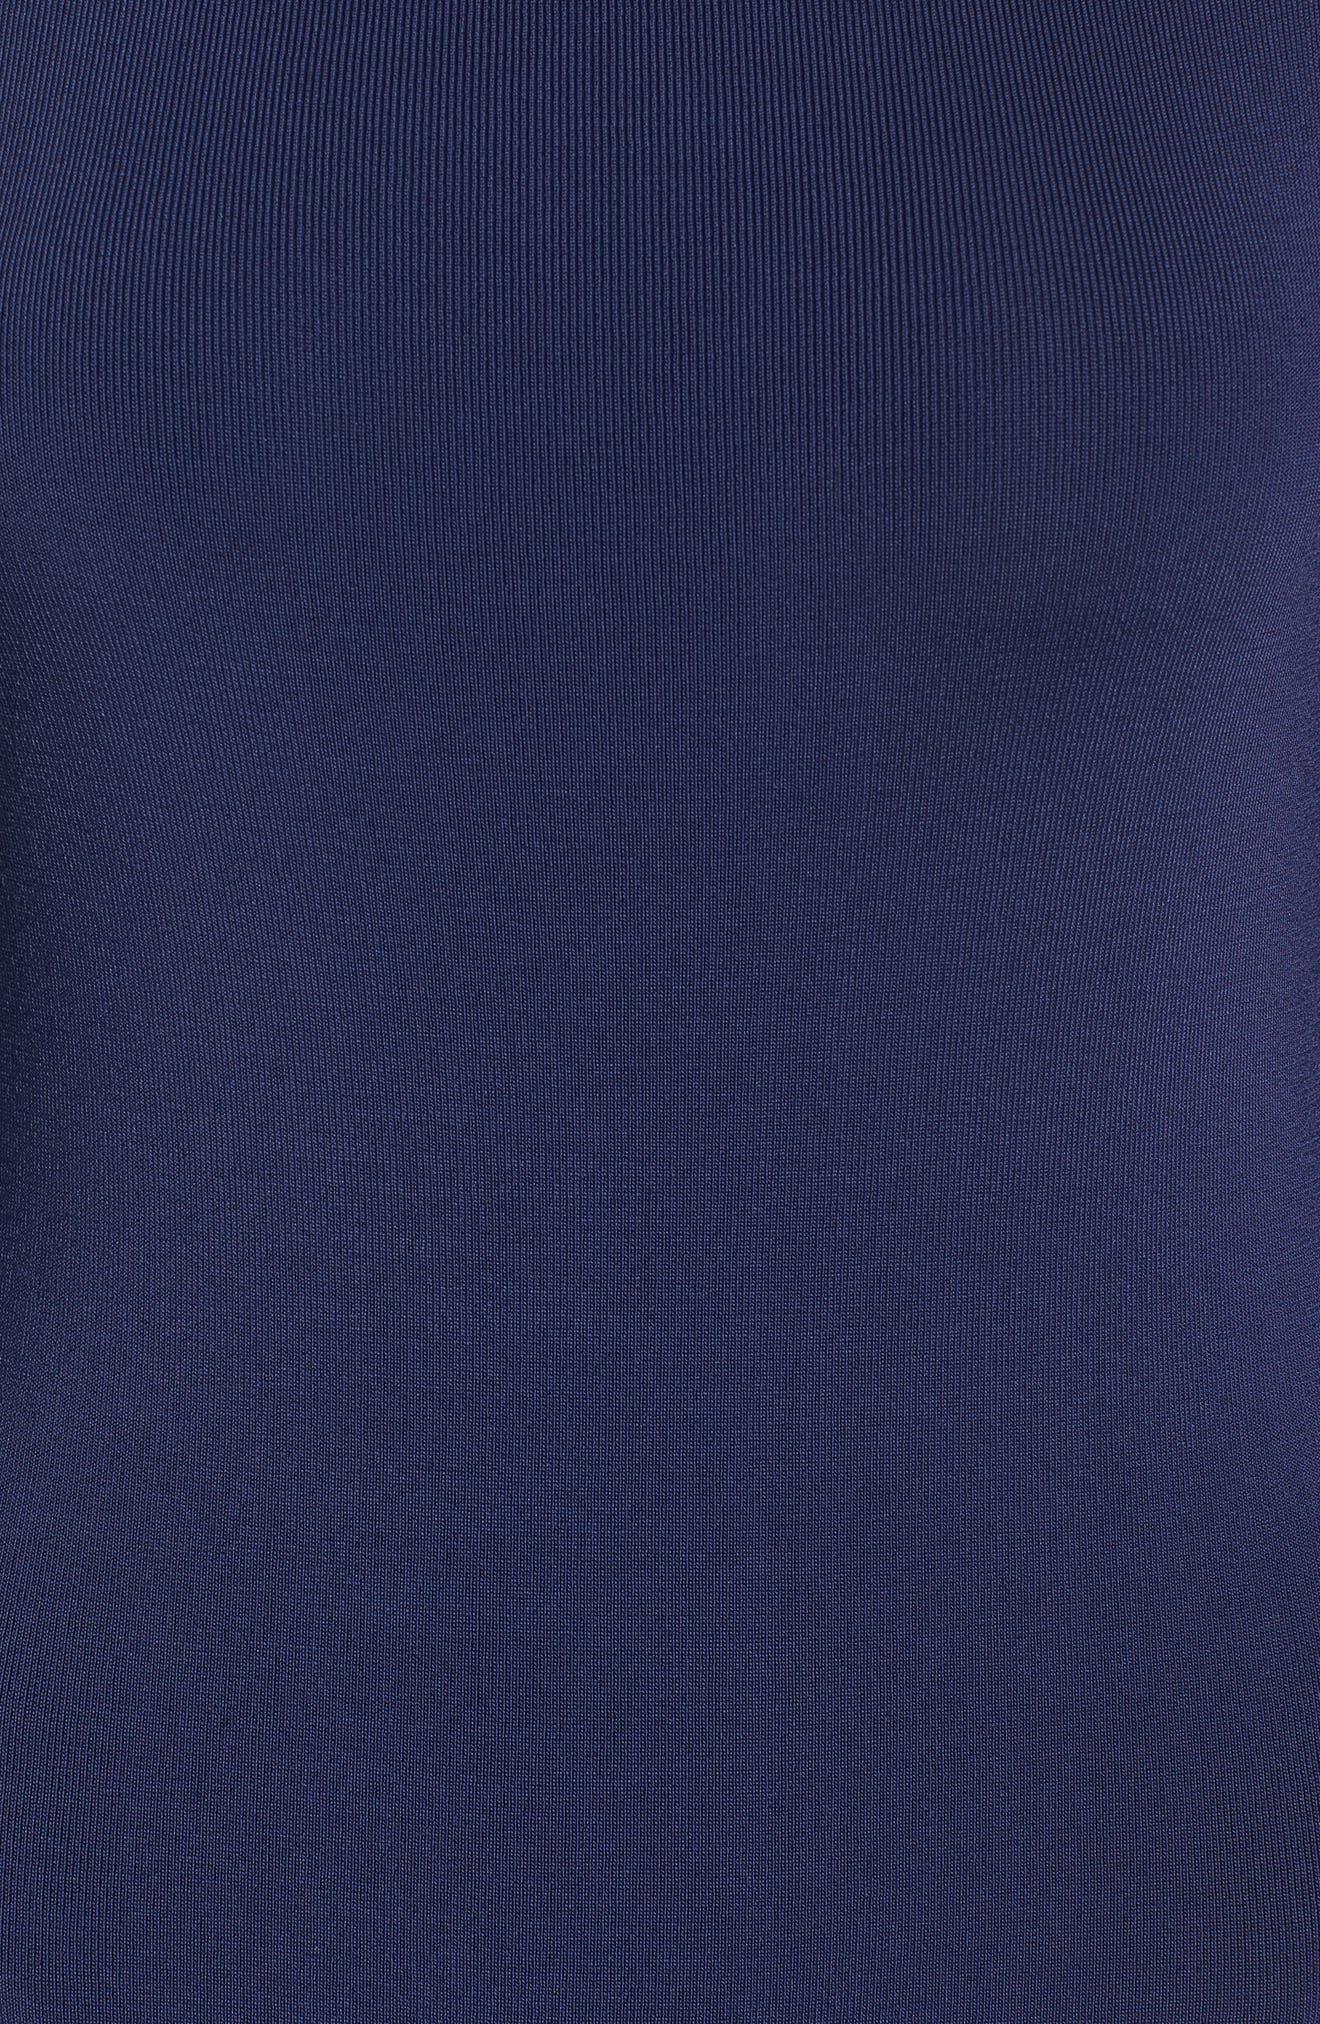 Bateau Neck Sweater Dress,                             Alternate thumbnail 5, color,                             Navy Peacoat